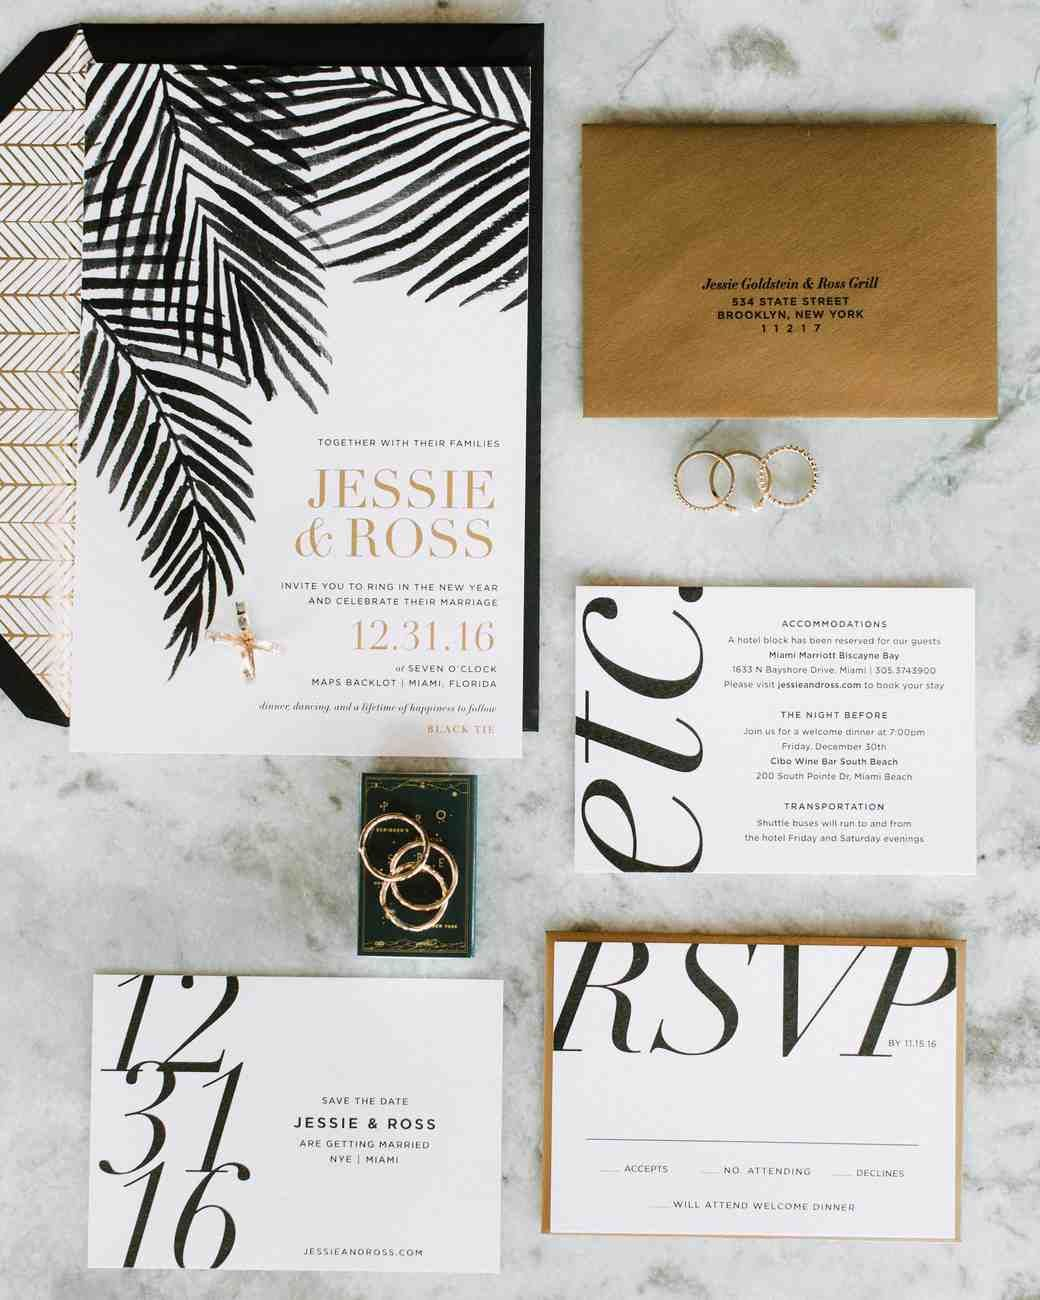 30 modern wedding invitations we love kara and james wedding board